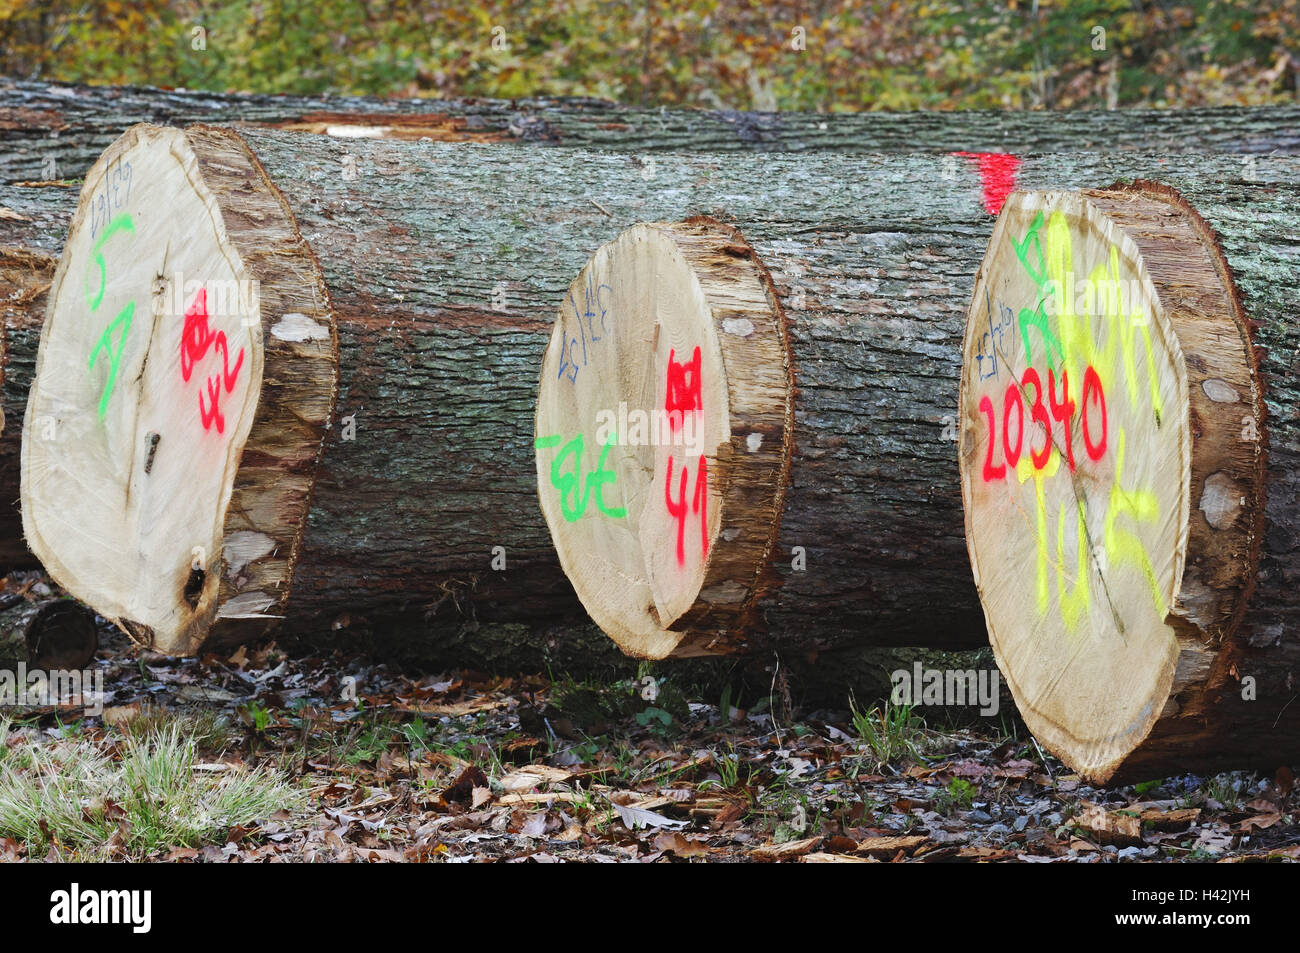 Wood, trees, likes, strains, selected, Bavaria, Spessart, Germany, - Stock Image